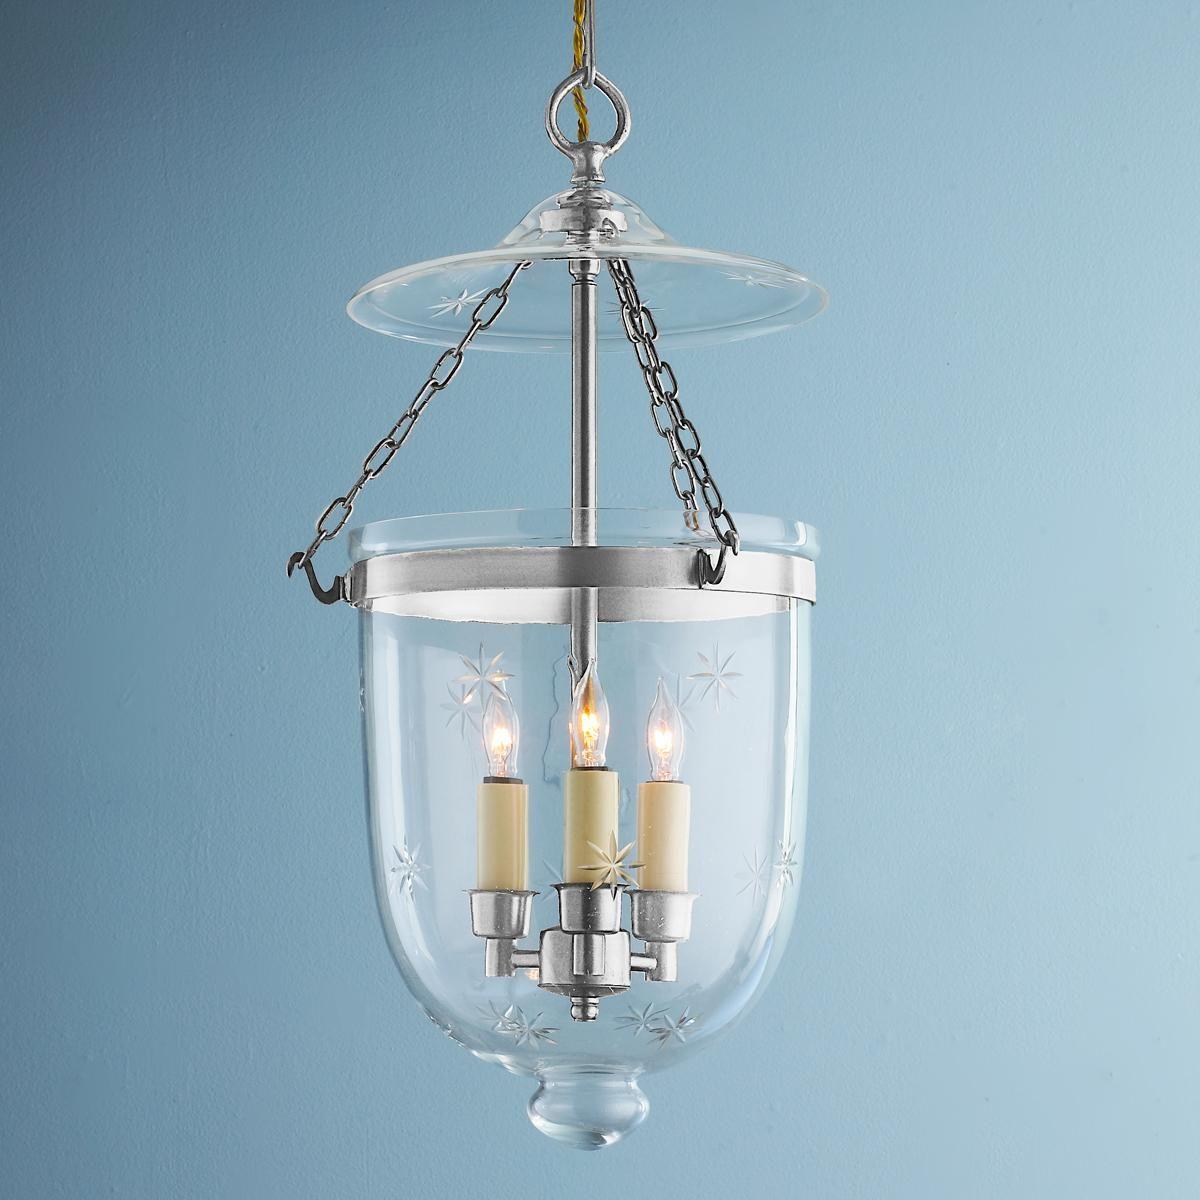 Engraved Star Glass Smokebell Lantern   Polished nickel, Glass and ...